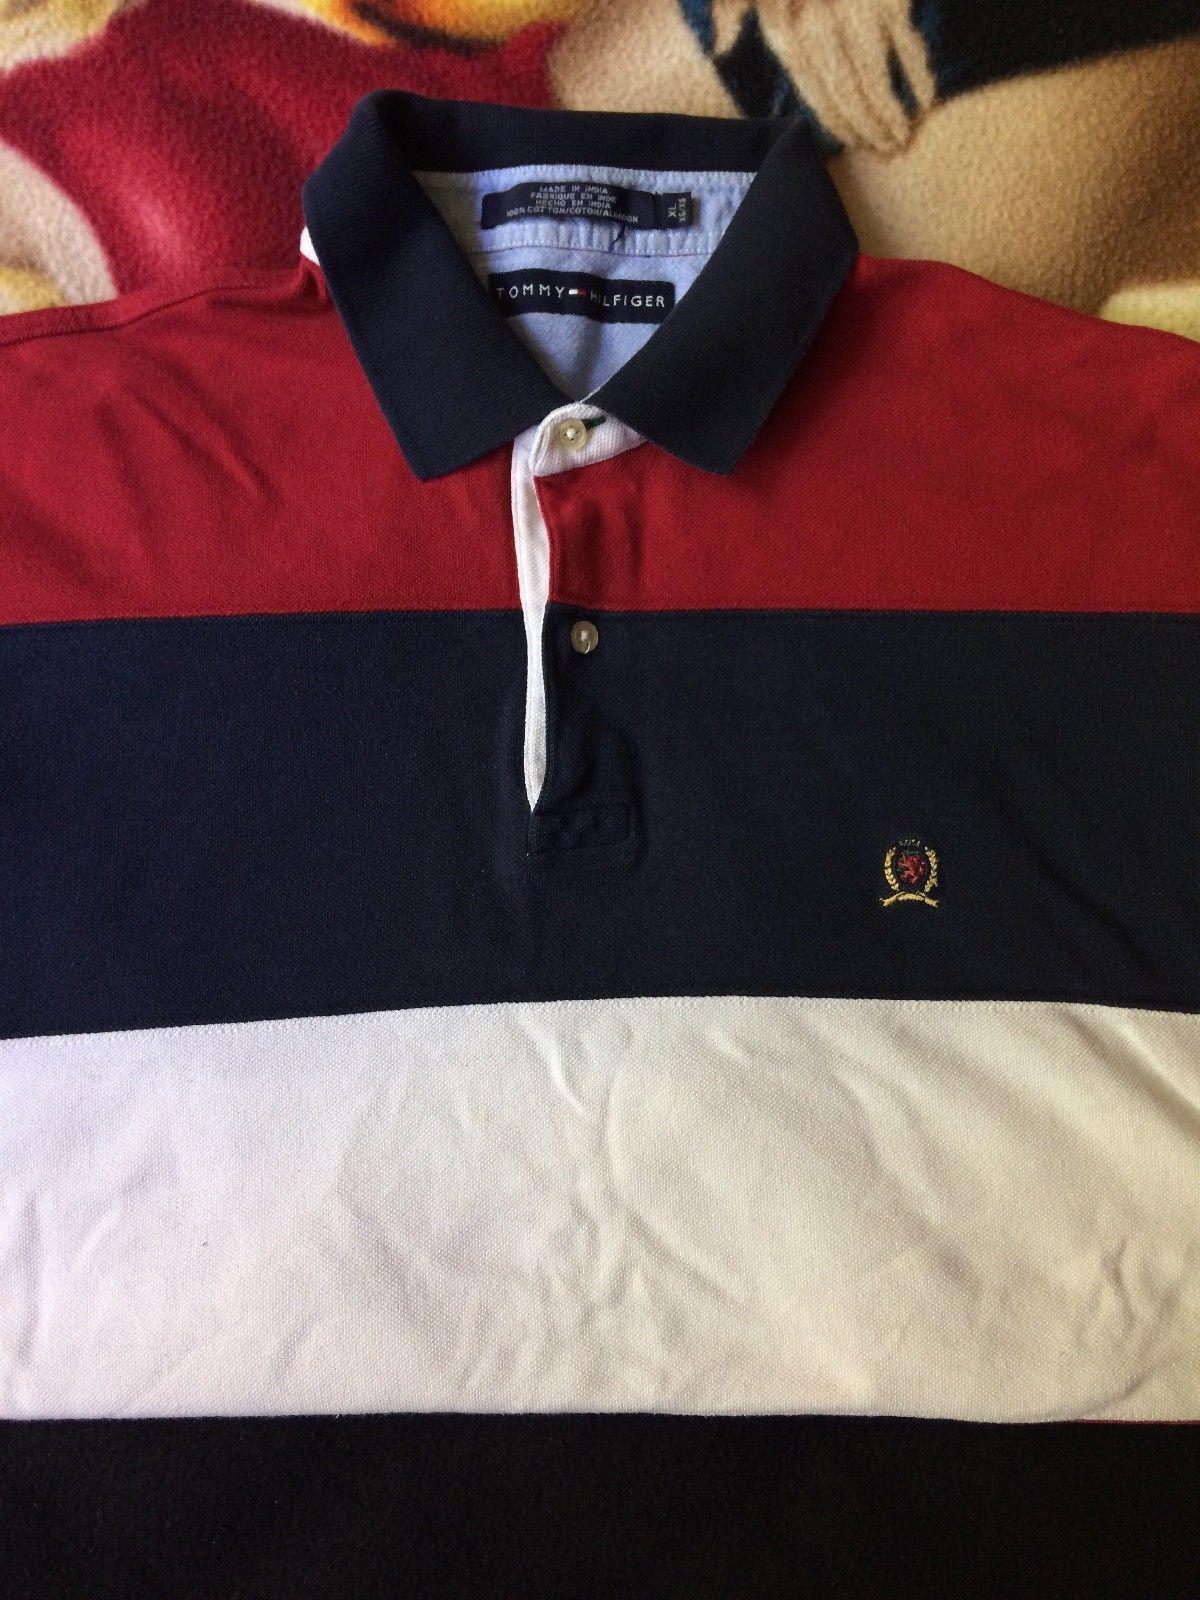 325eba11 Vintage Tommy Hilfiger Shirt Rugby Polo crest logo Long Sleeve Xl | eBay